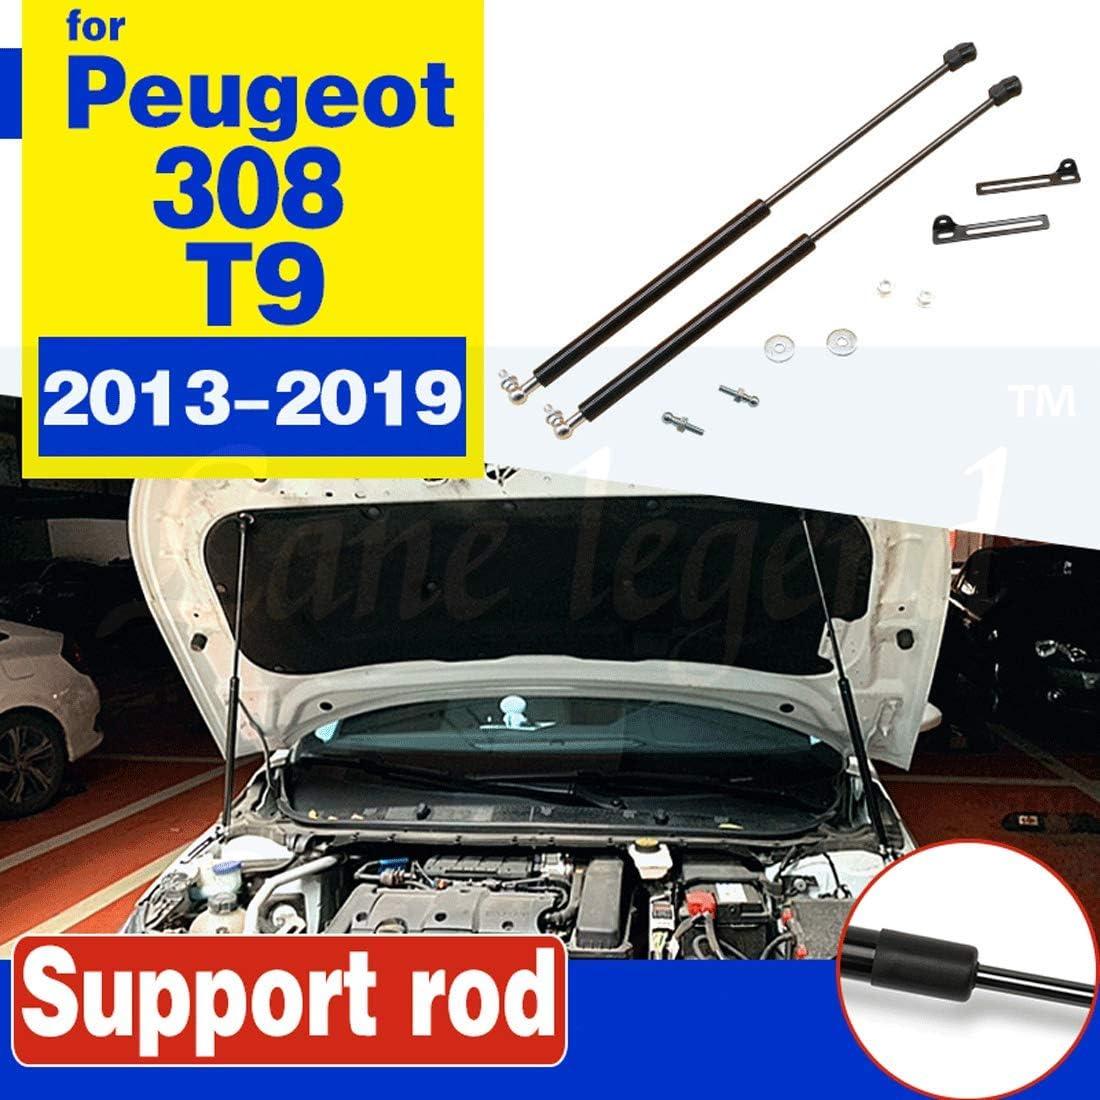 For Volkswagen VW T-ROC 2017 2018 Gas Springs Shocks Strut Bars Damper Car Styling HUAQIEMI 2Pcs Car Front Engine Hood Bonnet Lift Supports Props Rod Arm